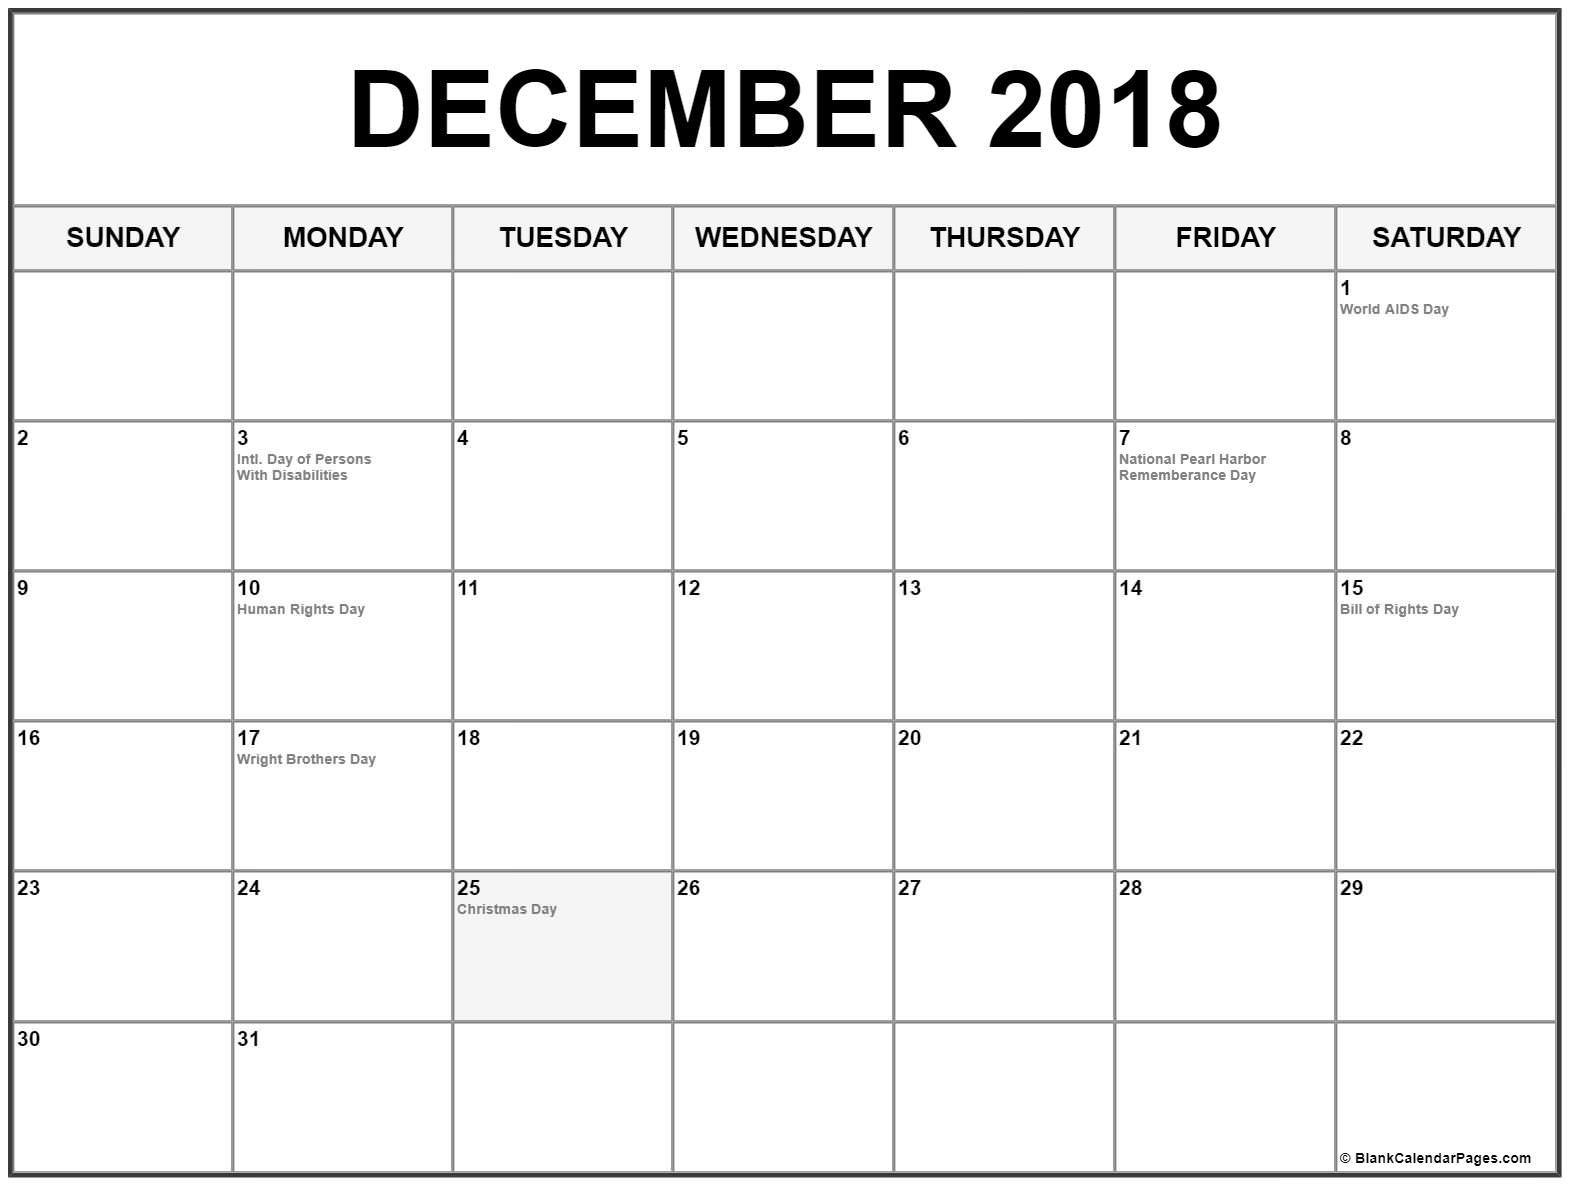 December 2018 Holidays Calendar December Calendar 2018